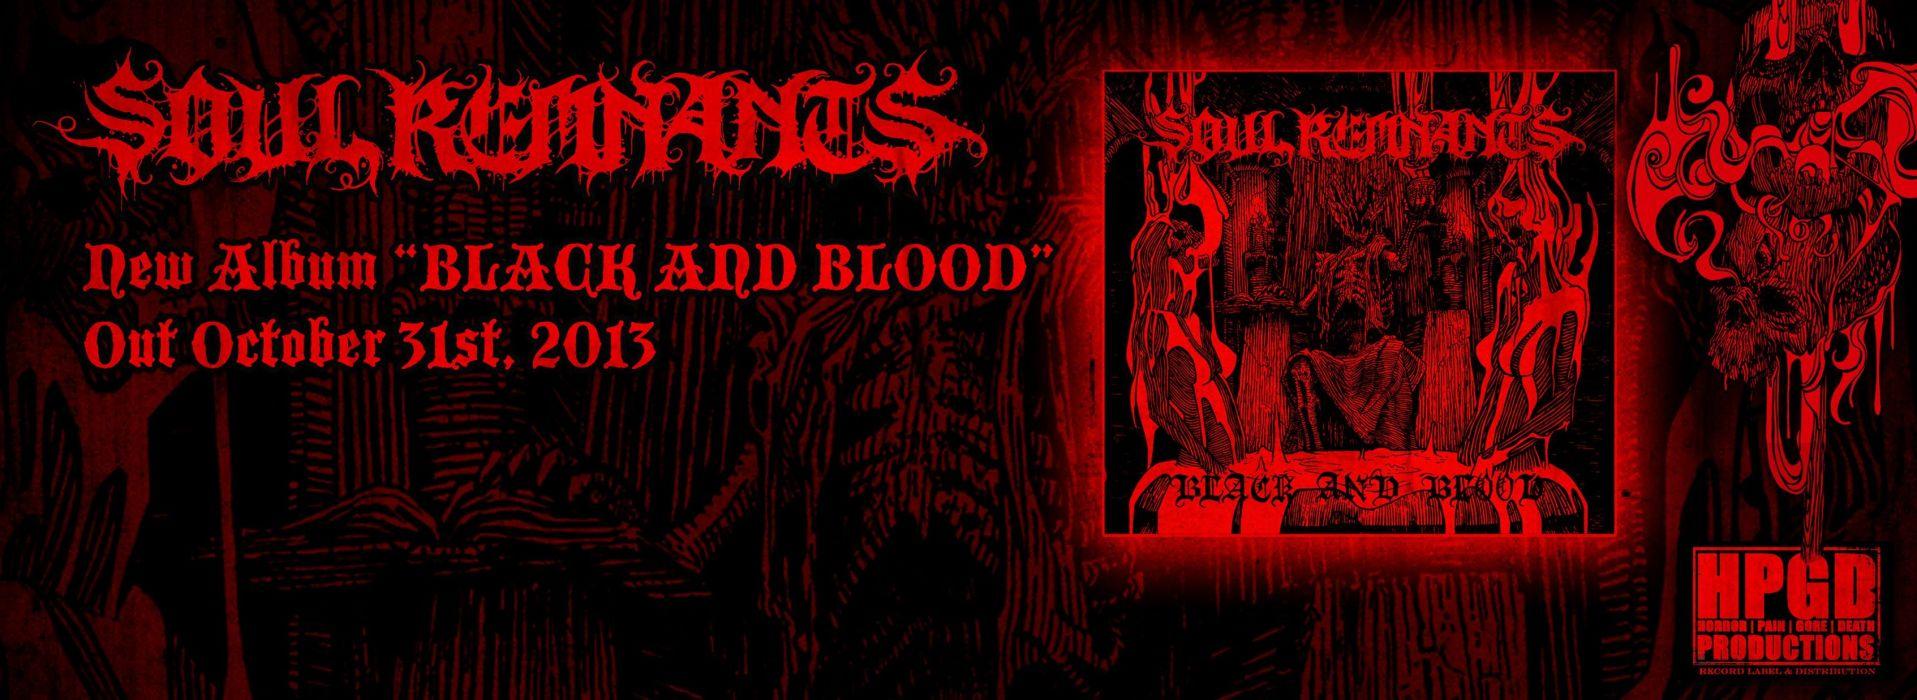 DEATH METAL black heavy blood poster wallpaper